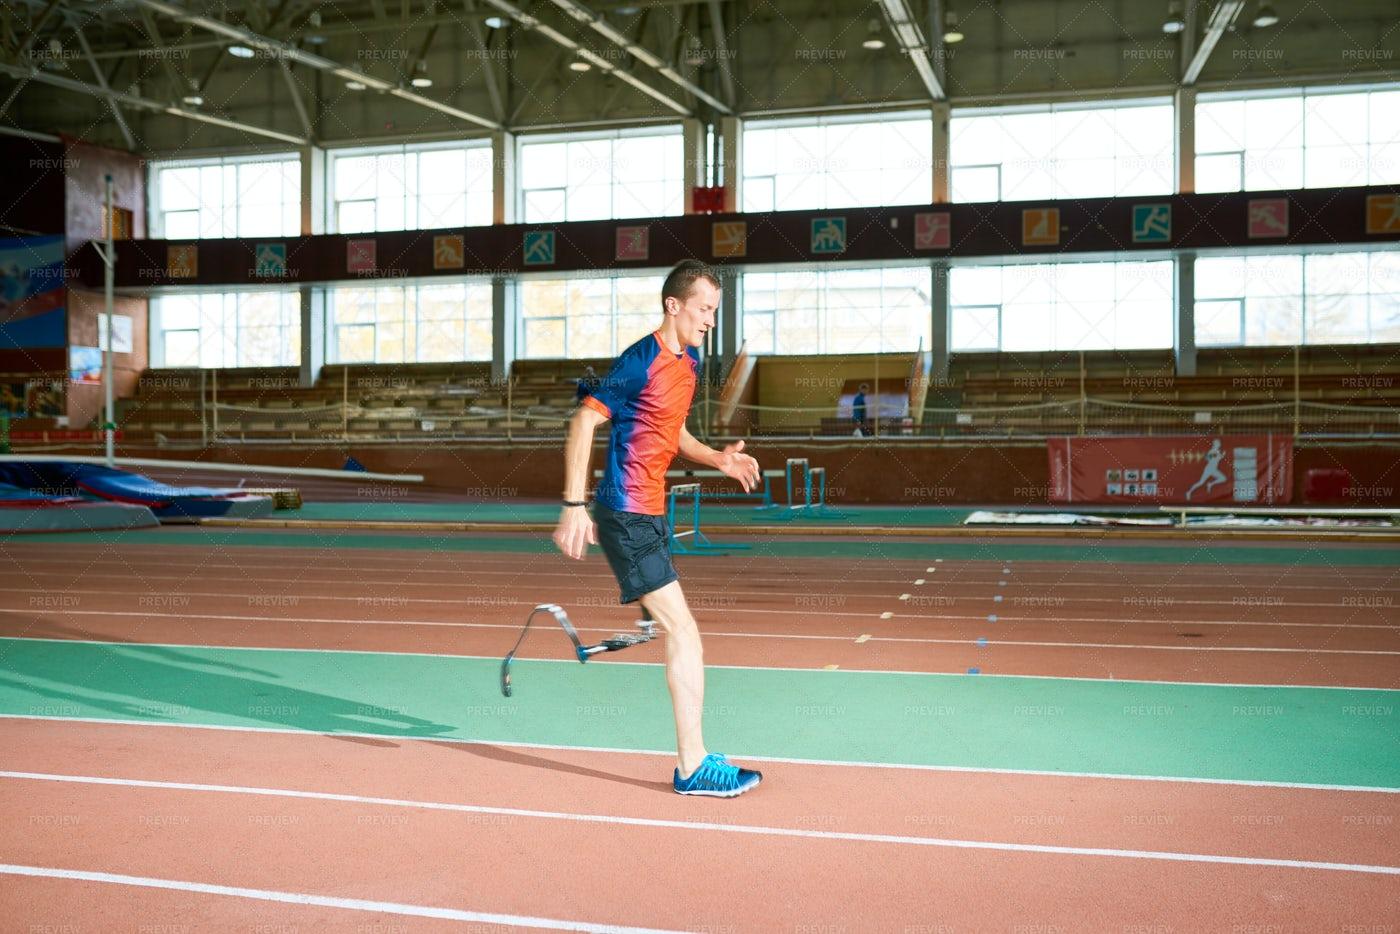 Handicapped Sportsman Running On...: Stock Photos